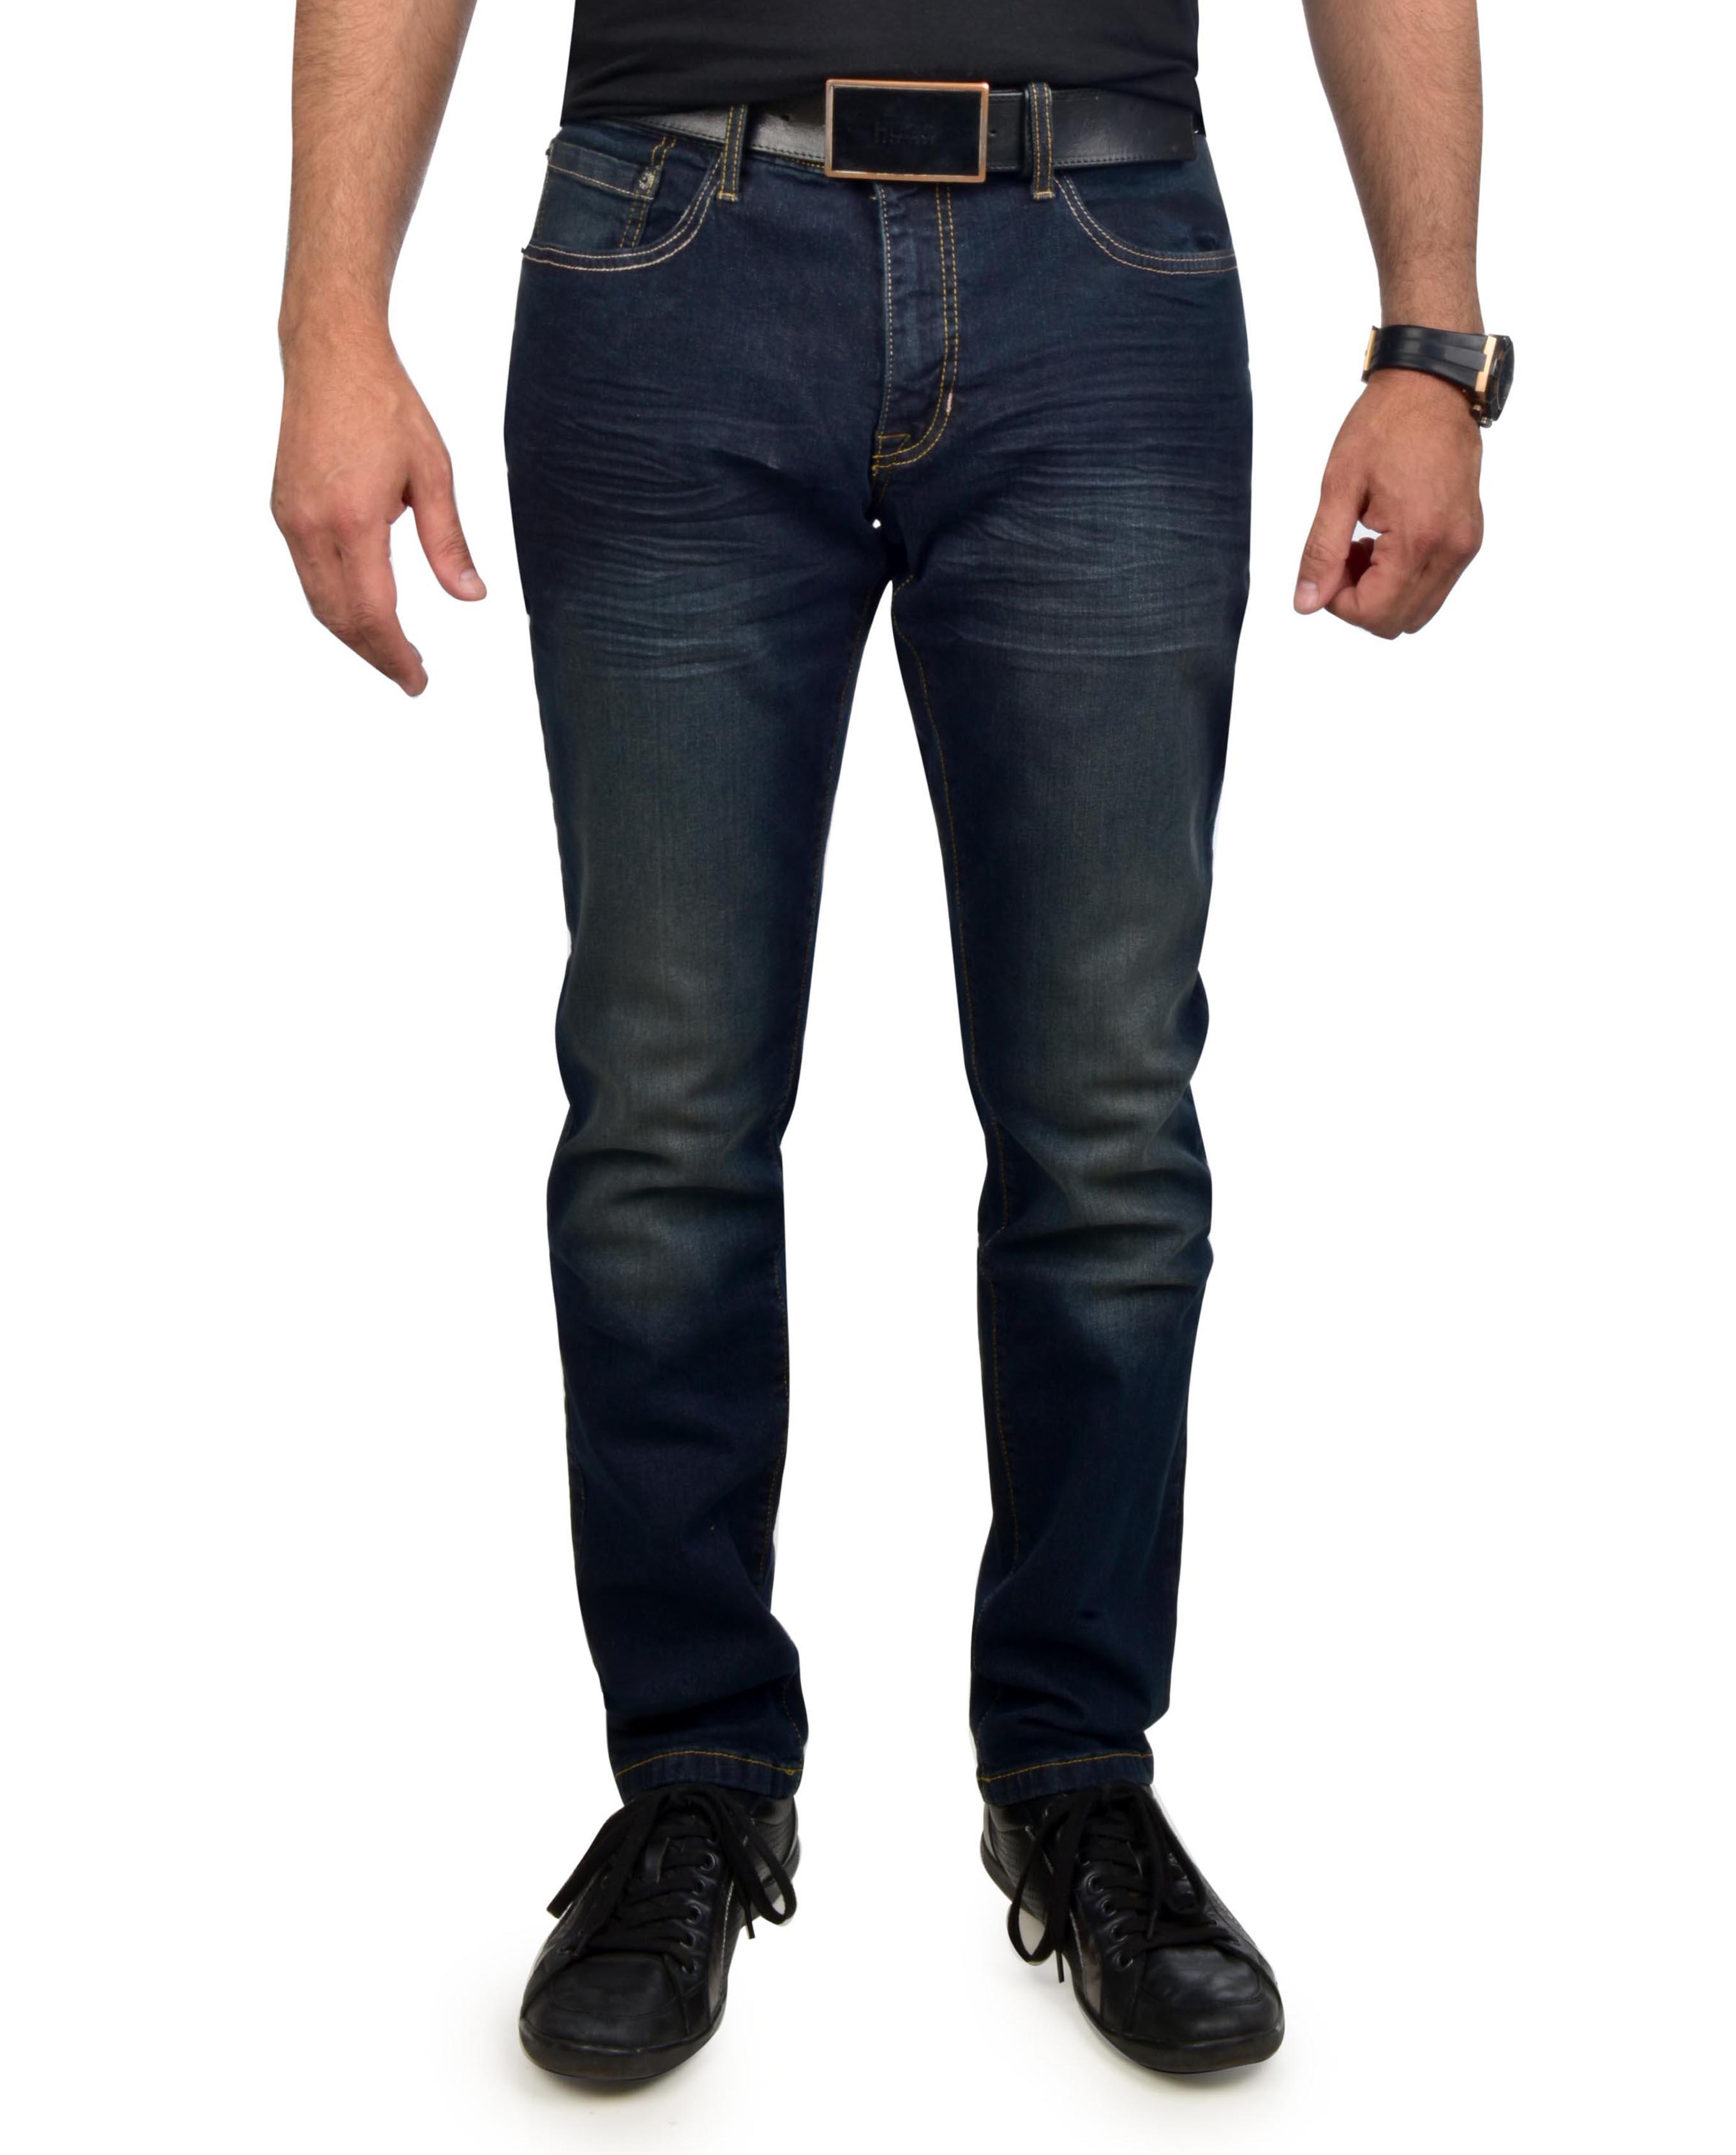 Izod Men's Comfort Stretch Slim Straight Fit Jeans